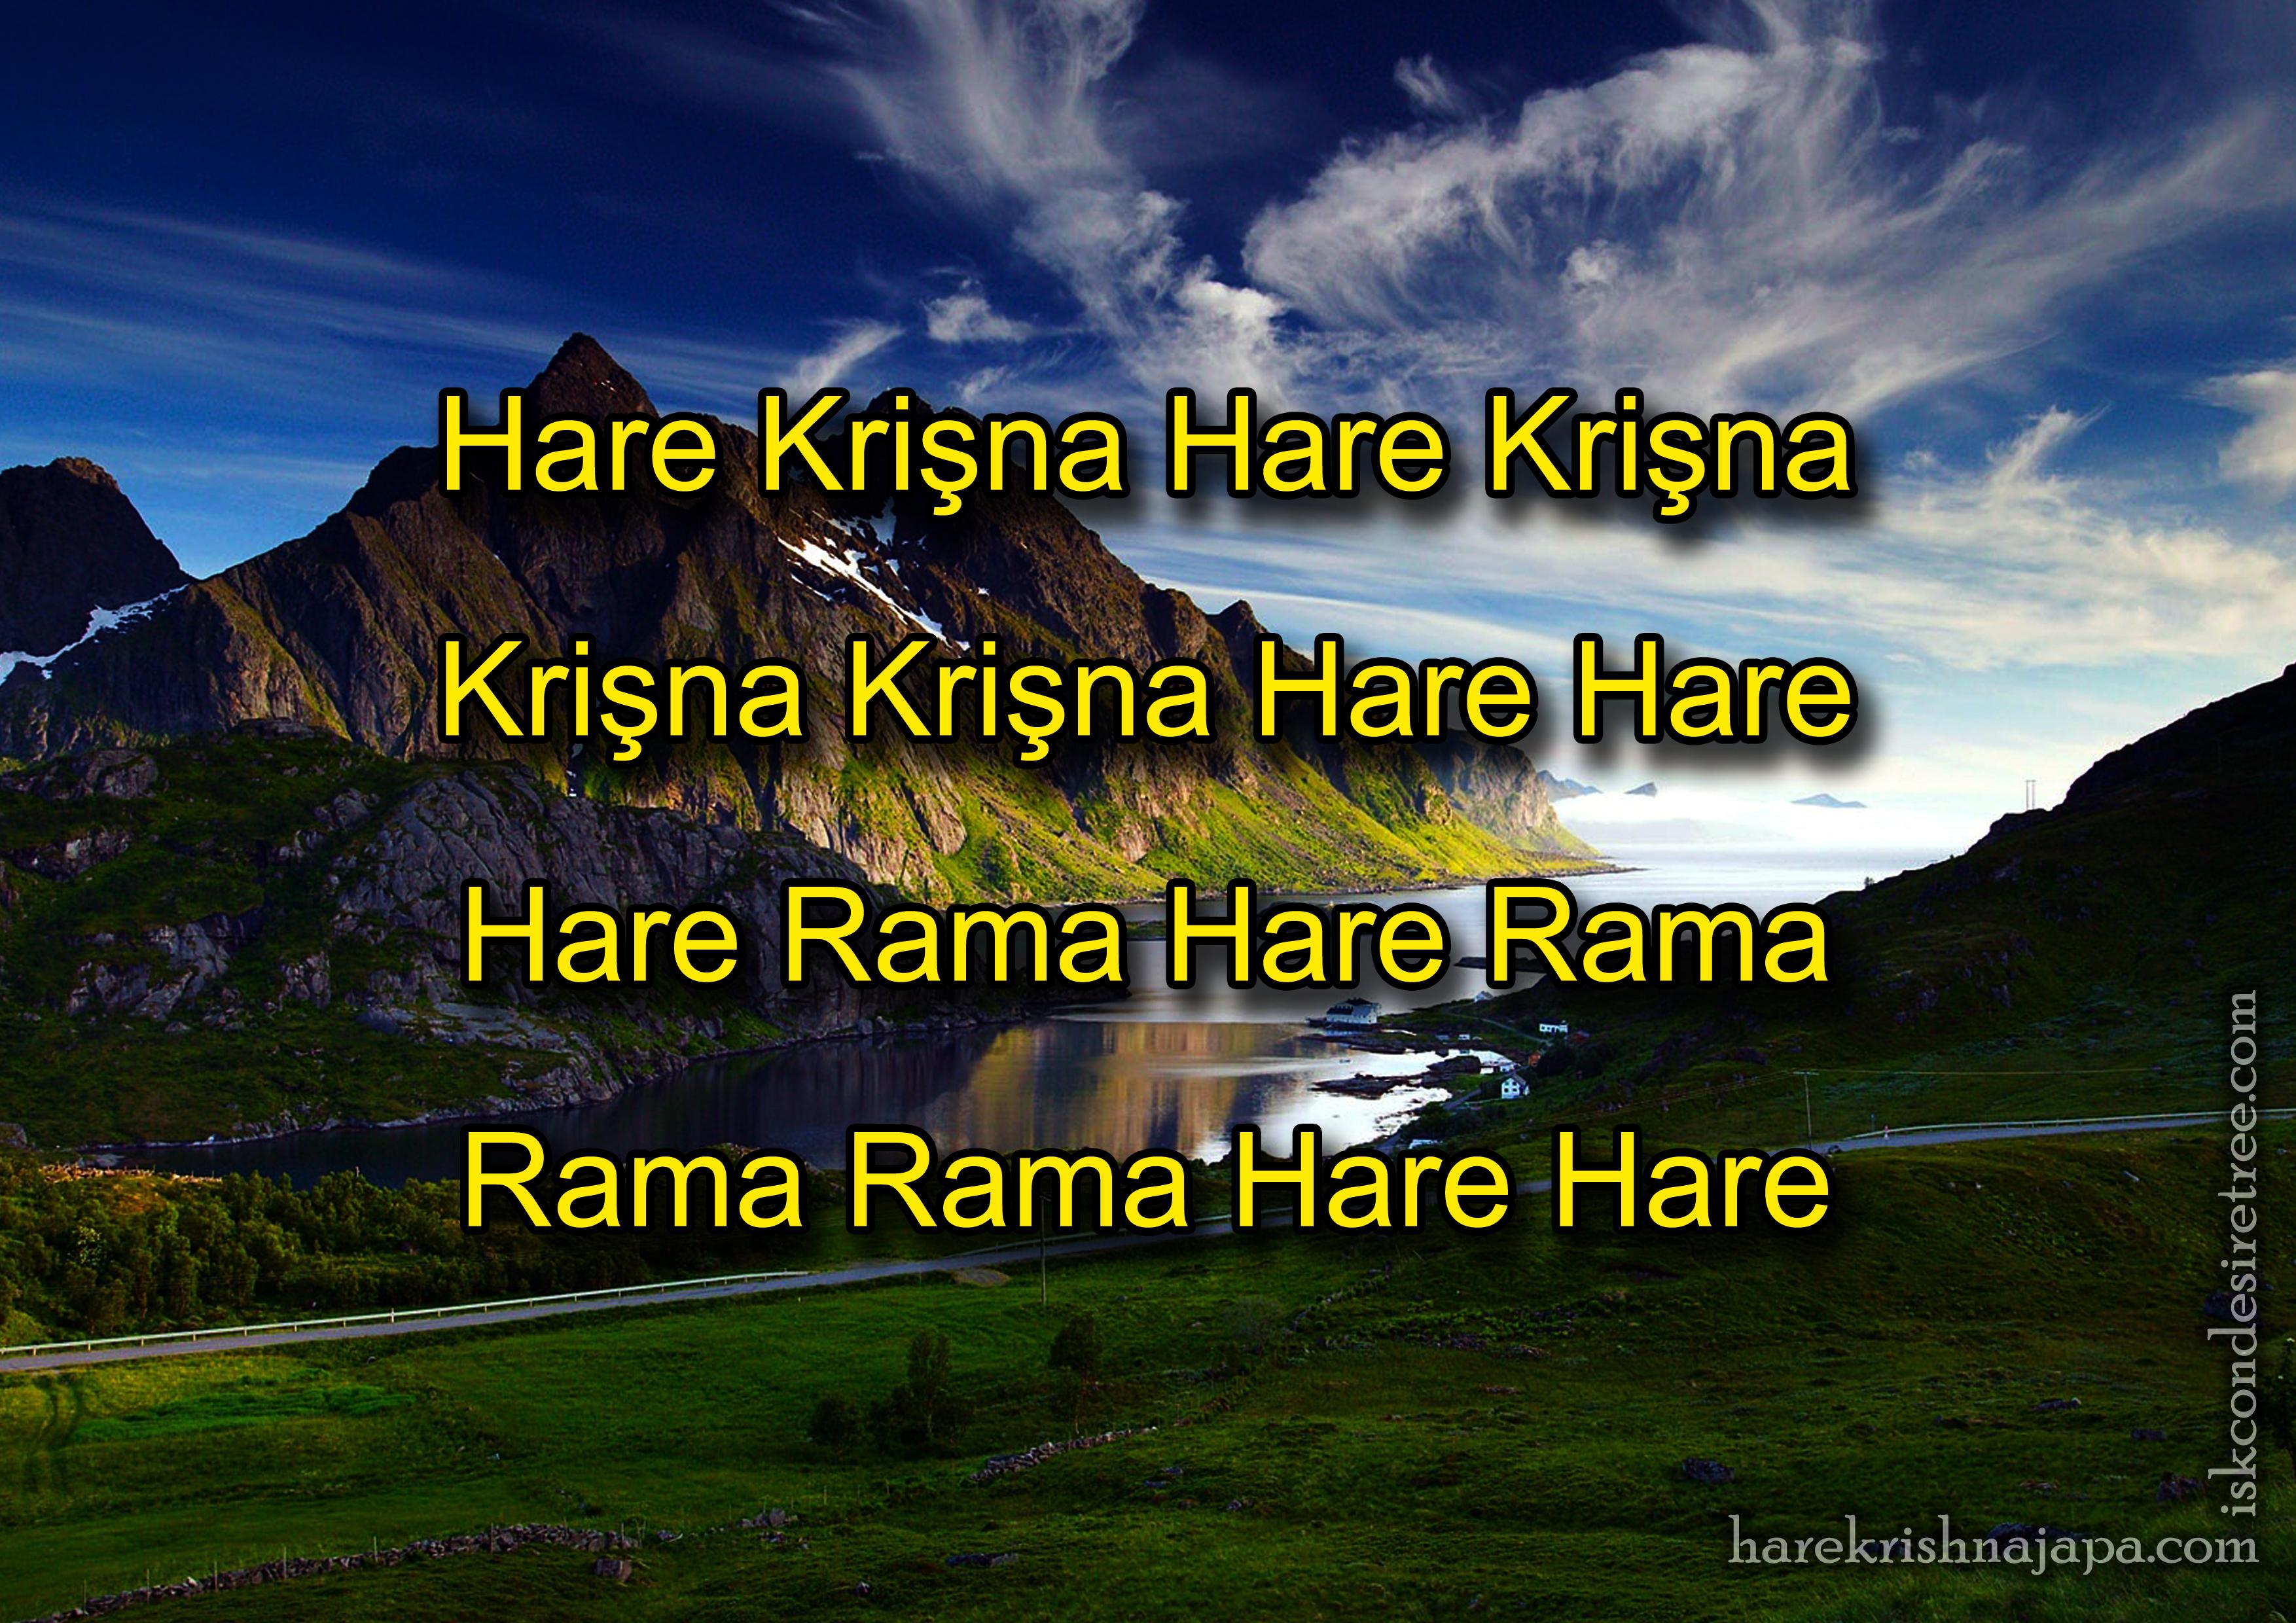 Hare-Krishna-Maha-Mantra-in-Turkmen-Four-Line-002.jpg (3508×2480)